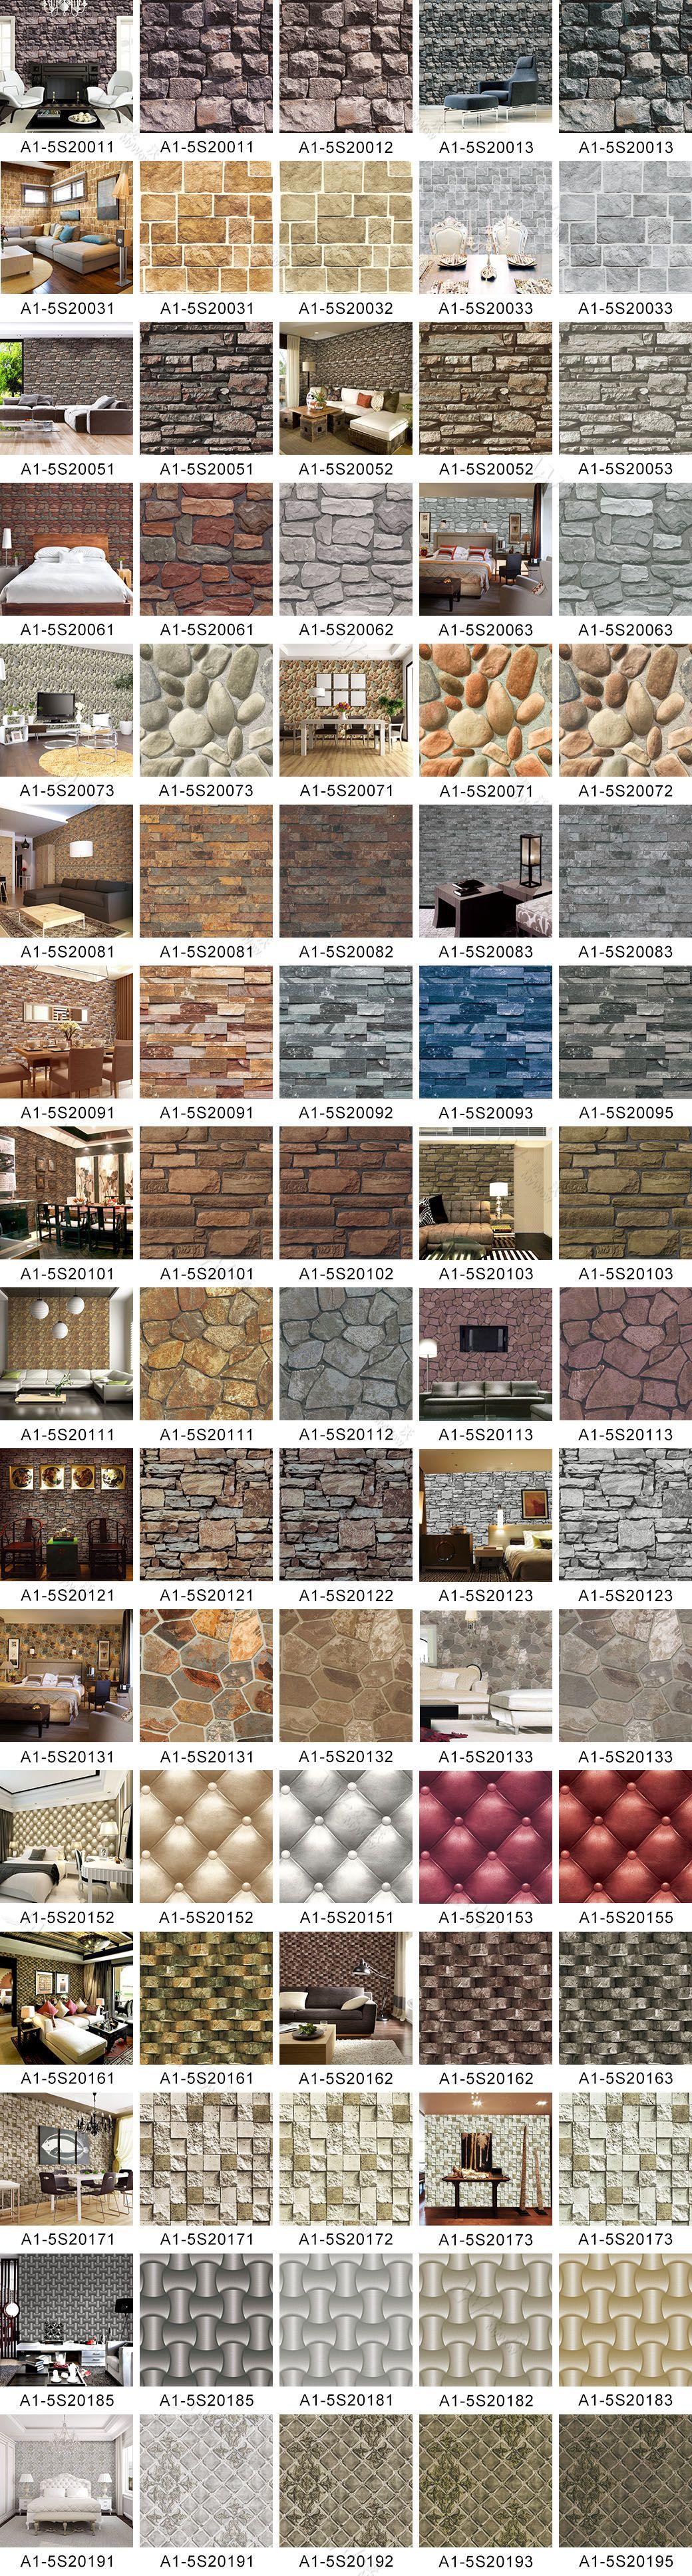 A1-4 Fashion Home Decorative PVC 3D Brick Stone Wallpaper Style: 3D ...